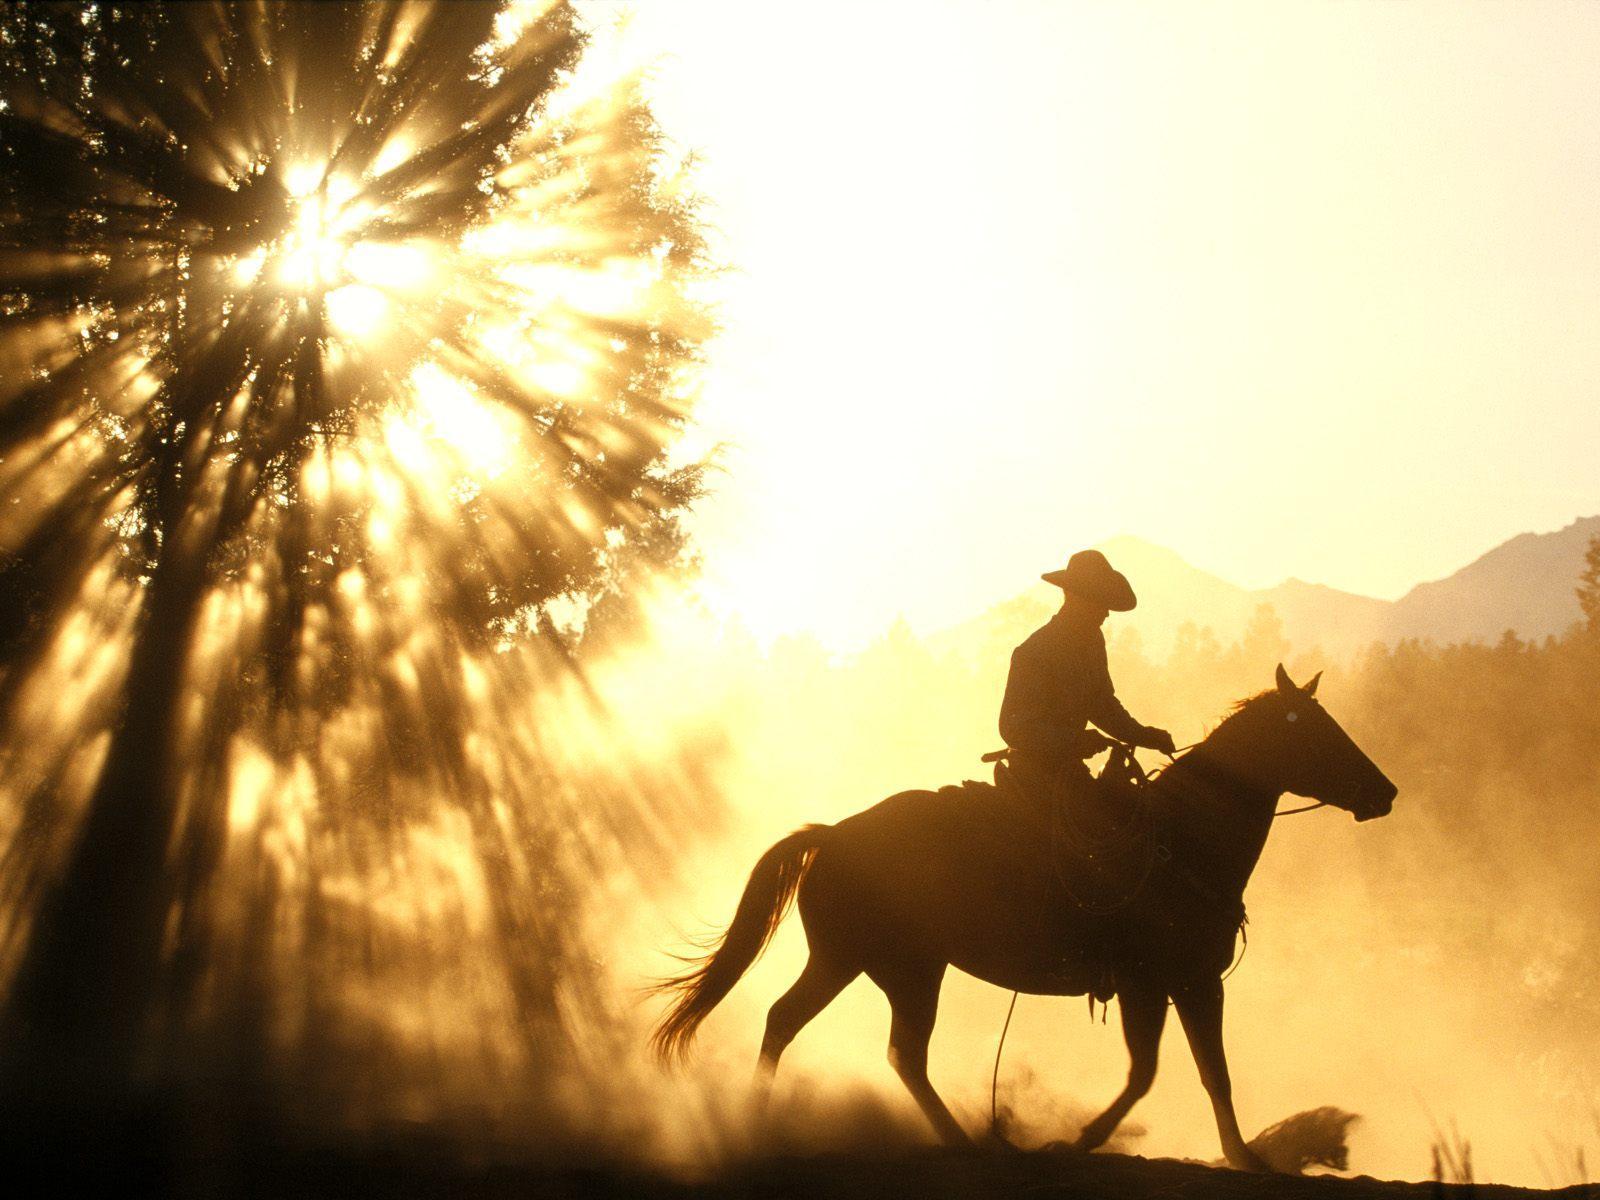 cowboy horse sunset free desktop wallpaper download cowboy horse